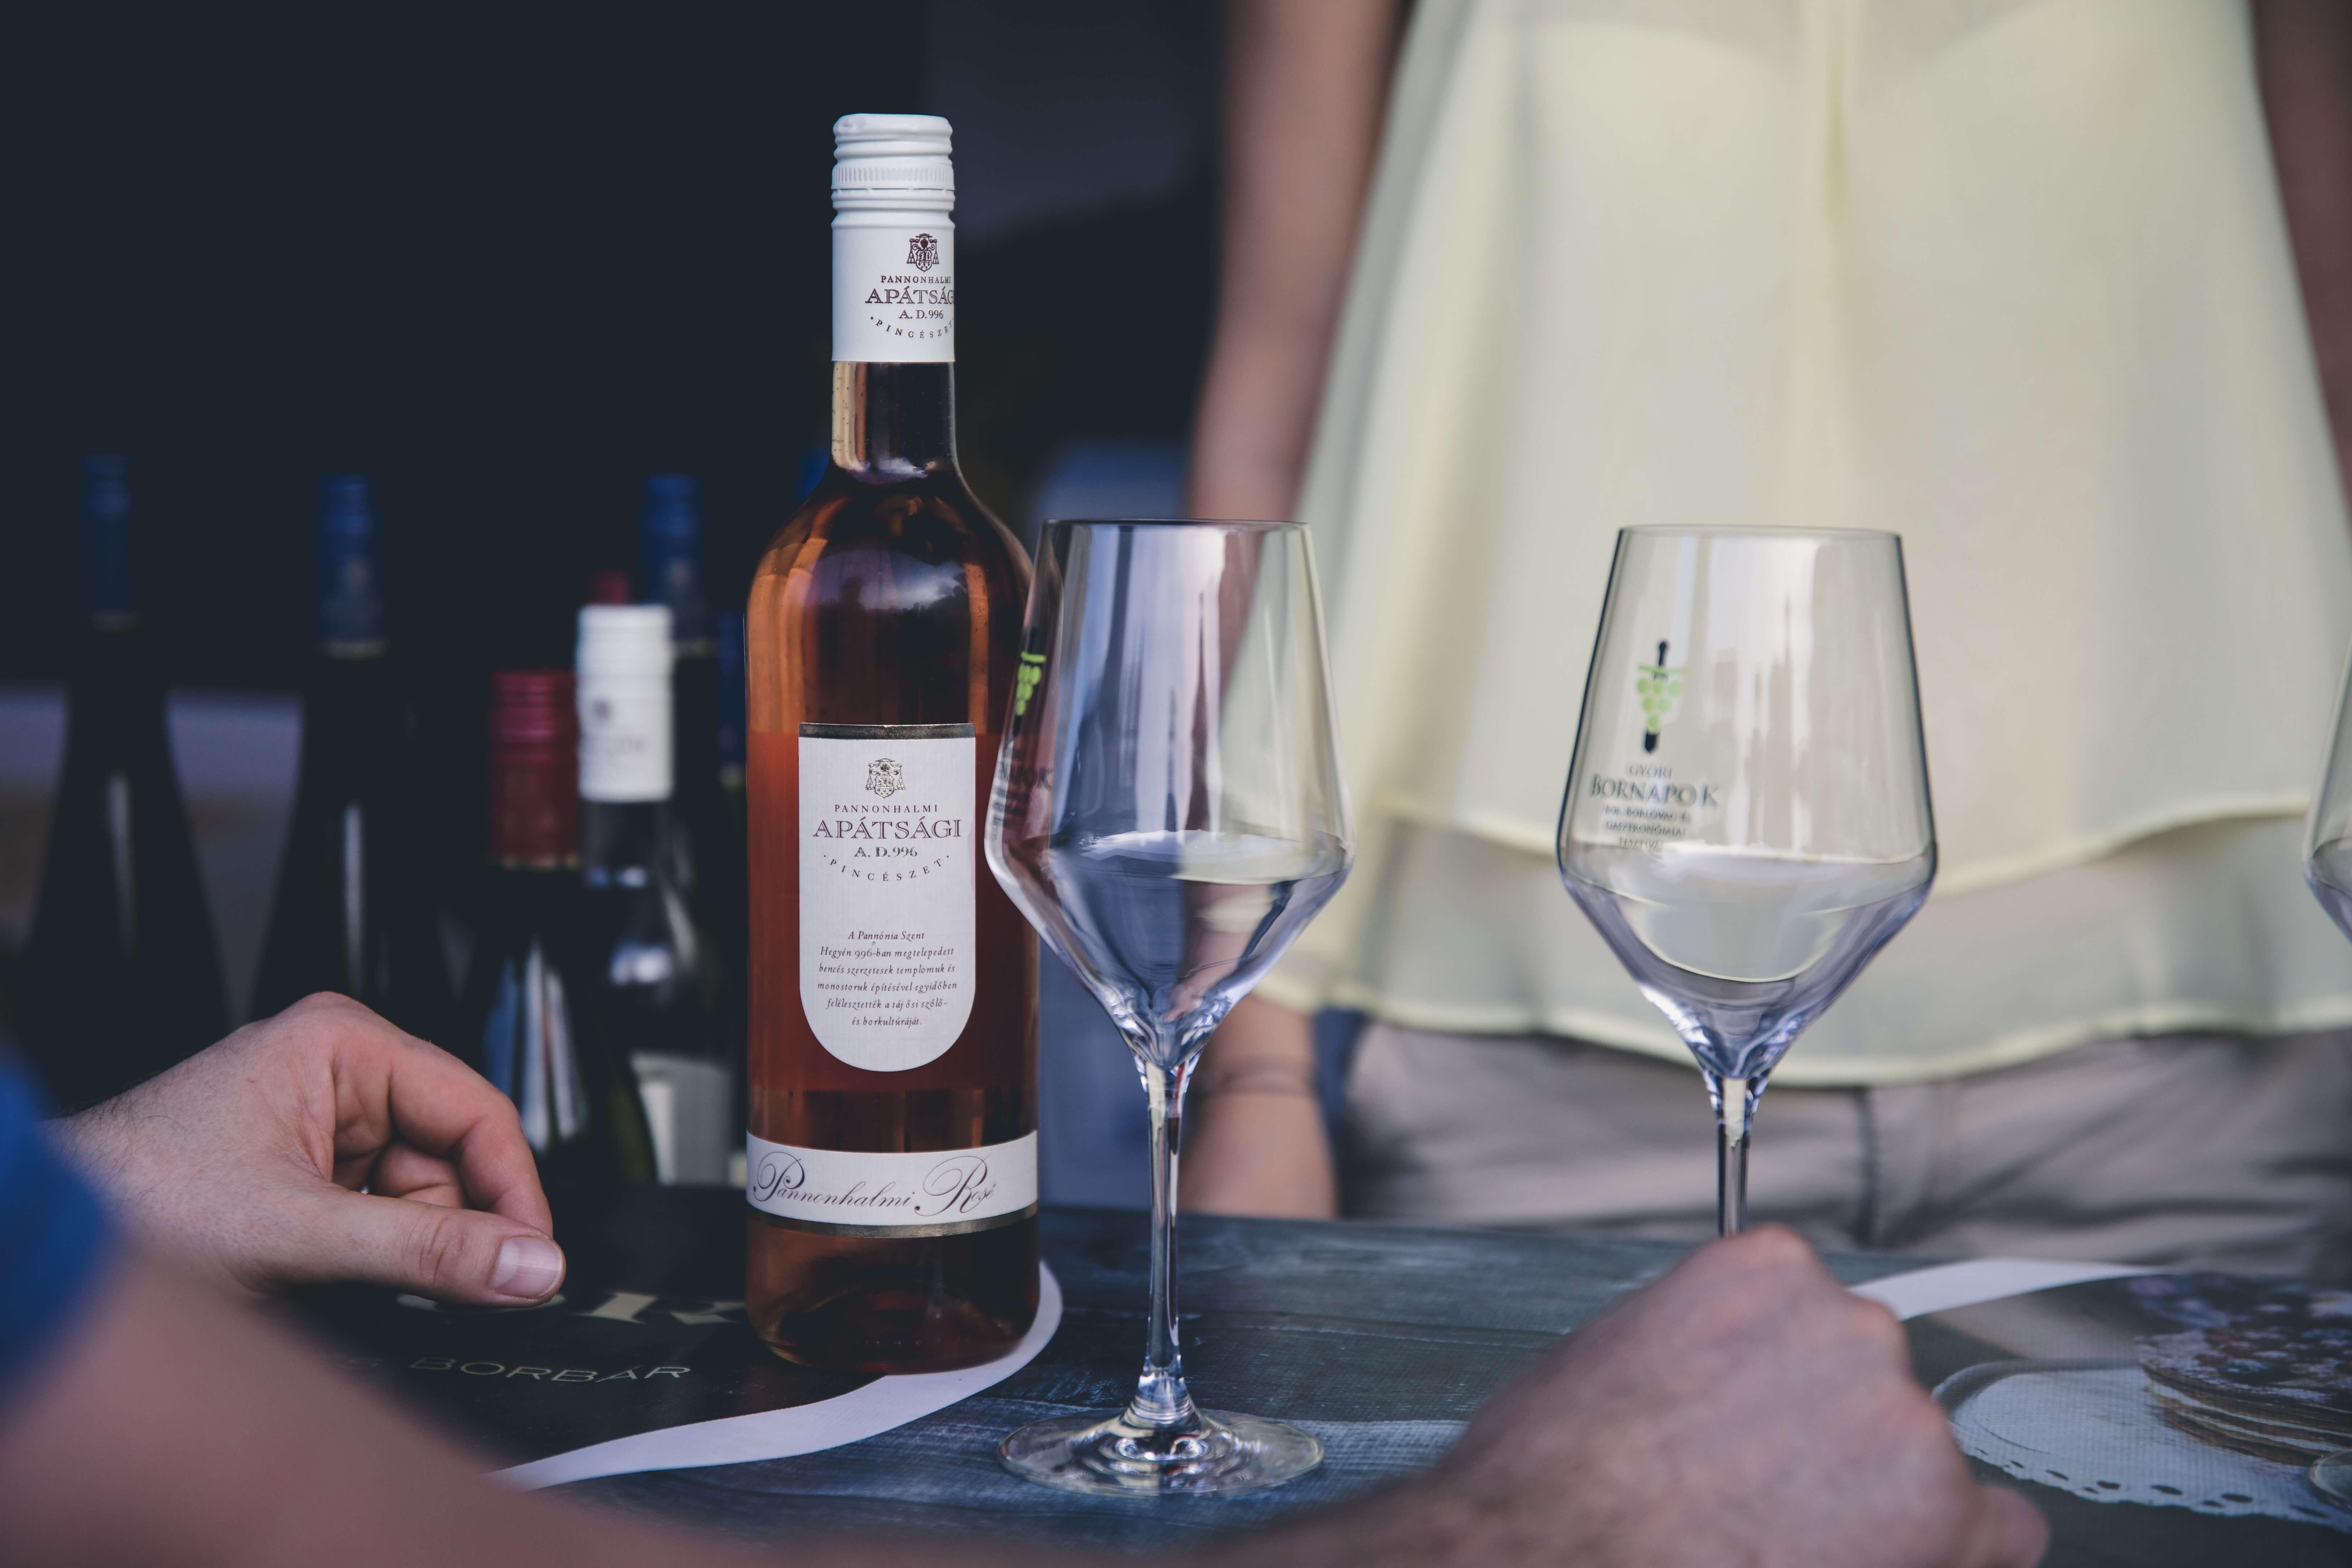 Smart Wine Glass is revolutionizing wine tastings